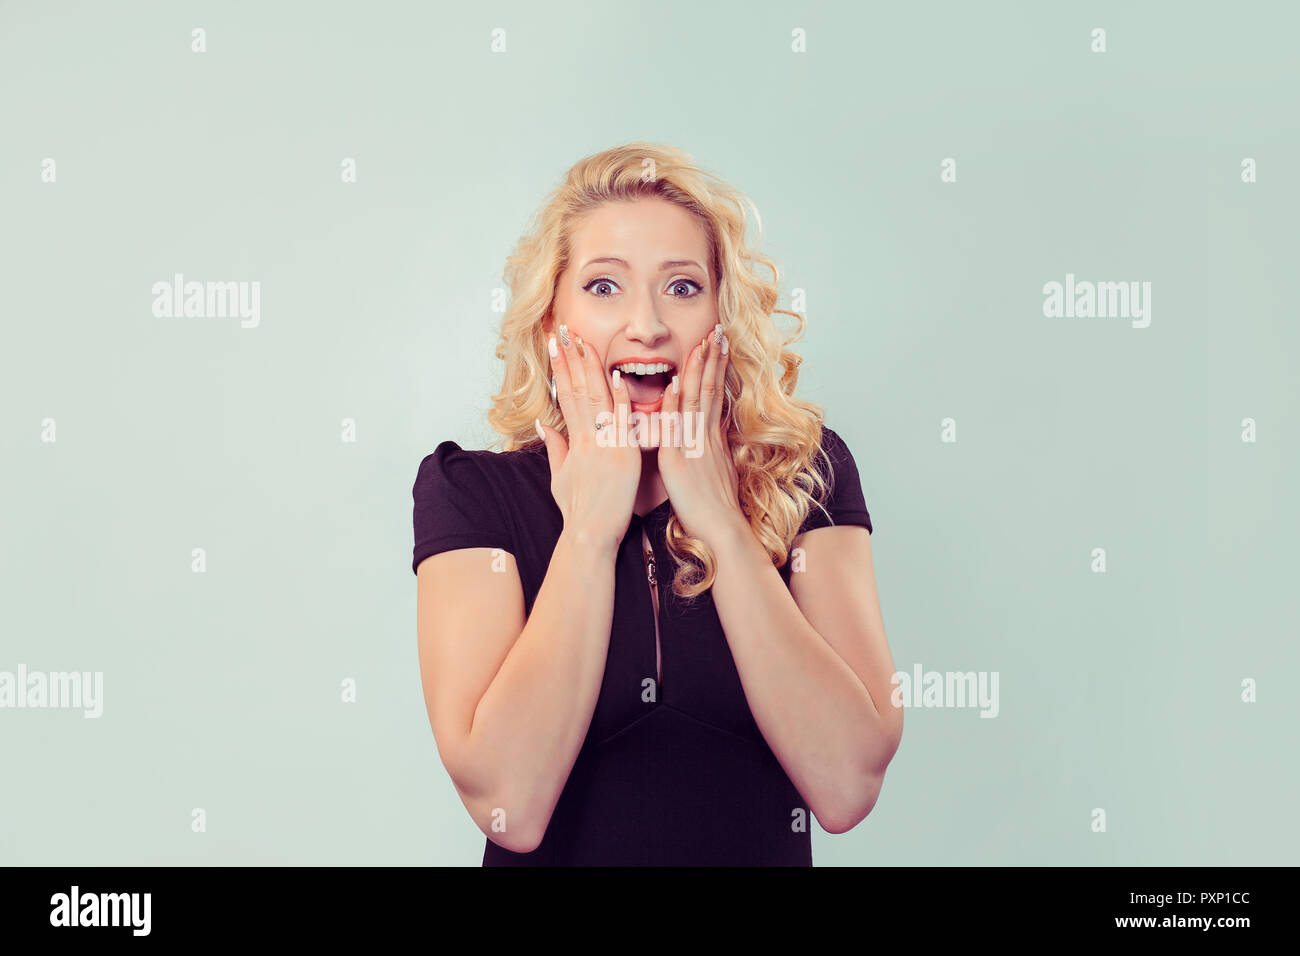 Super amazed screaming woman - Stock Image